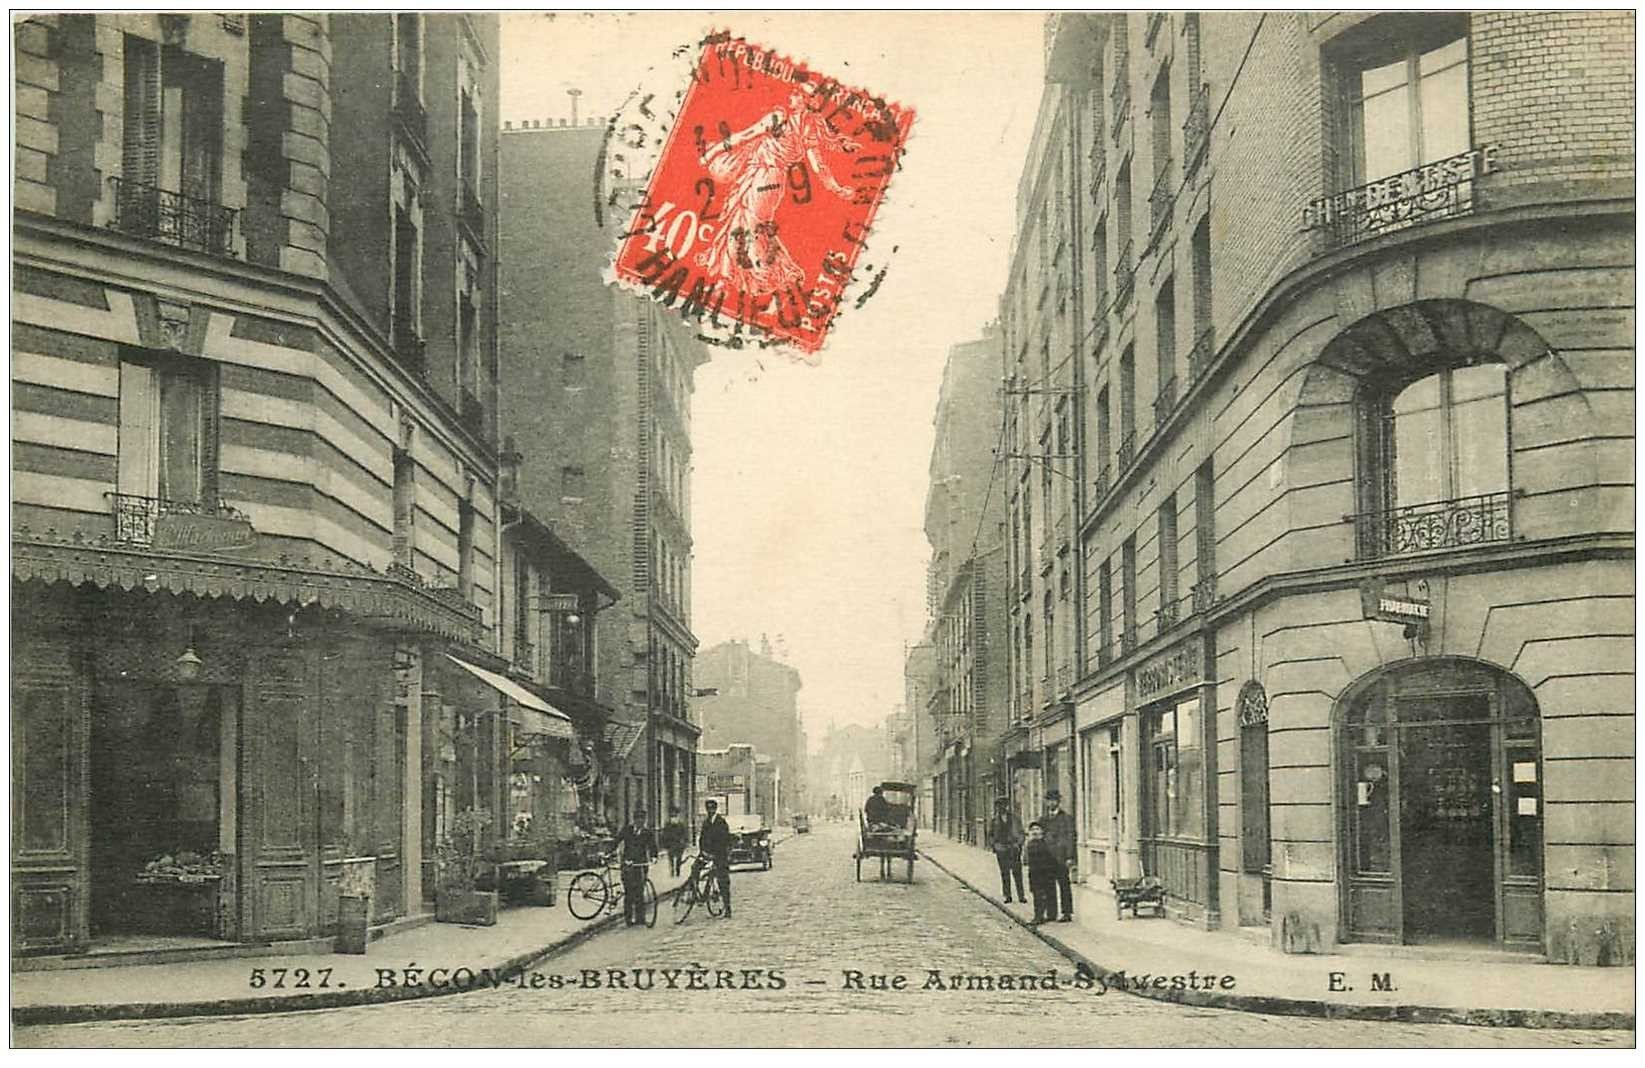 carte postale ancienne K. 92 BECON-LES-BRUYERES. Pharmacie Rue Armand Sylvestre 1919